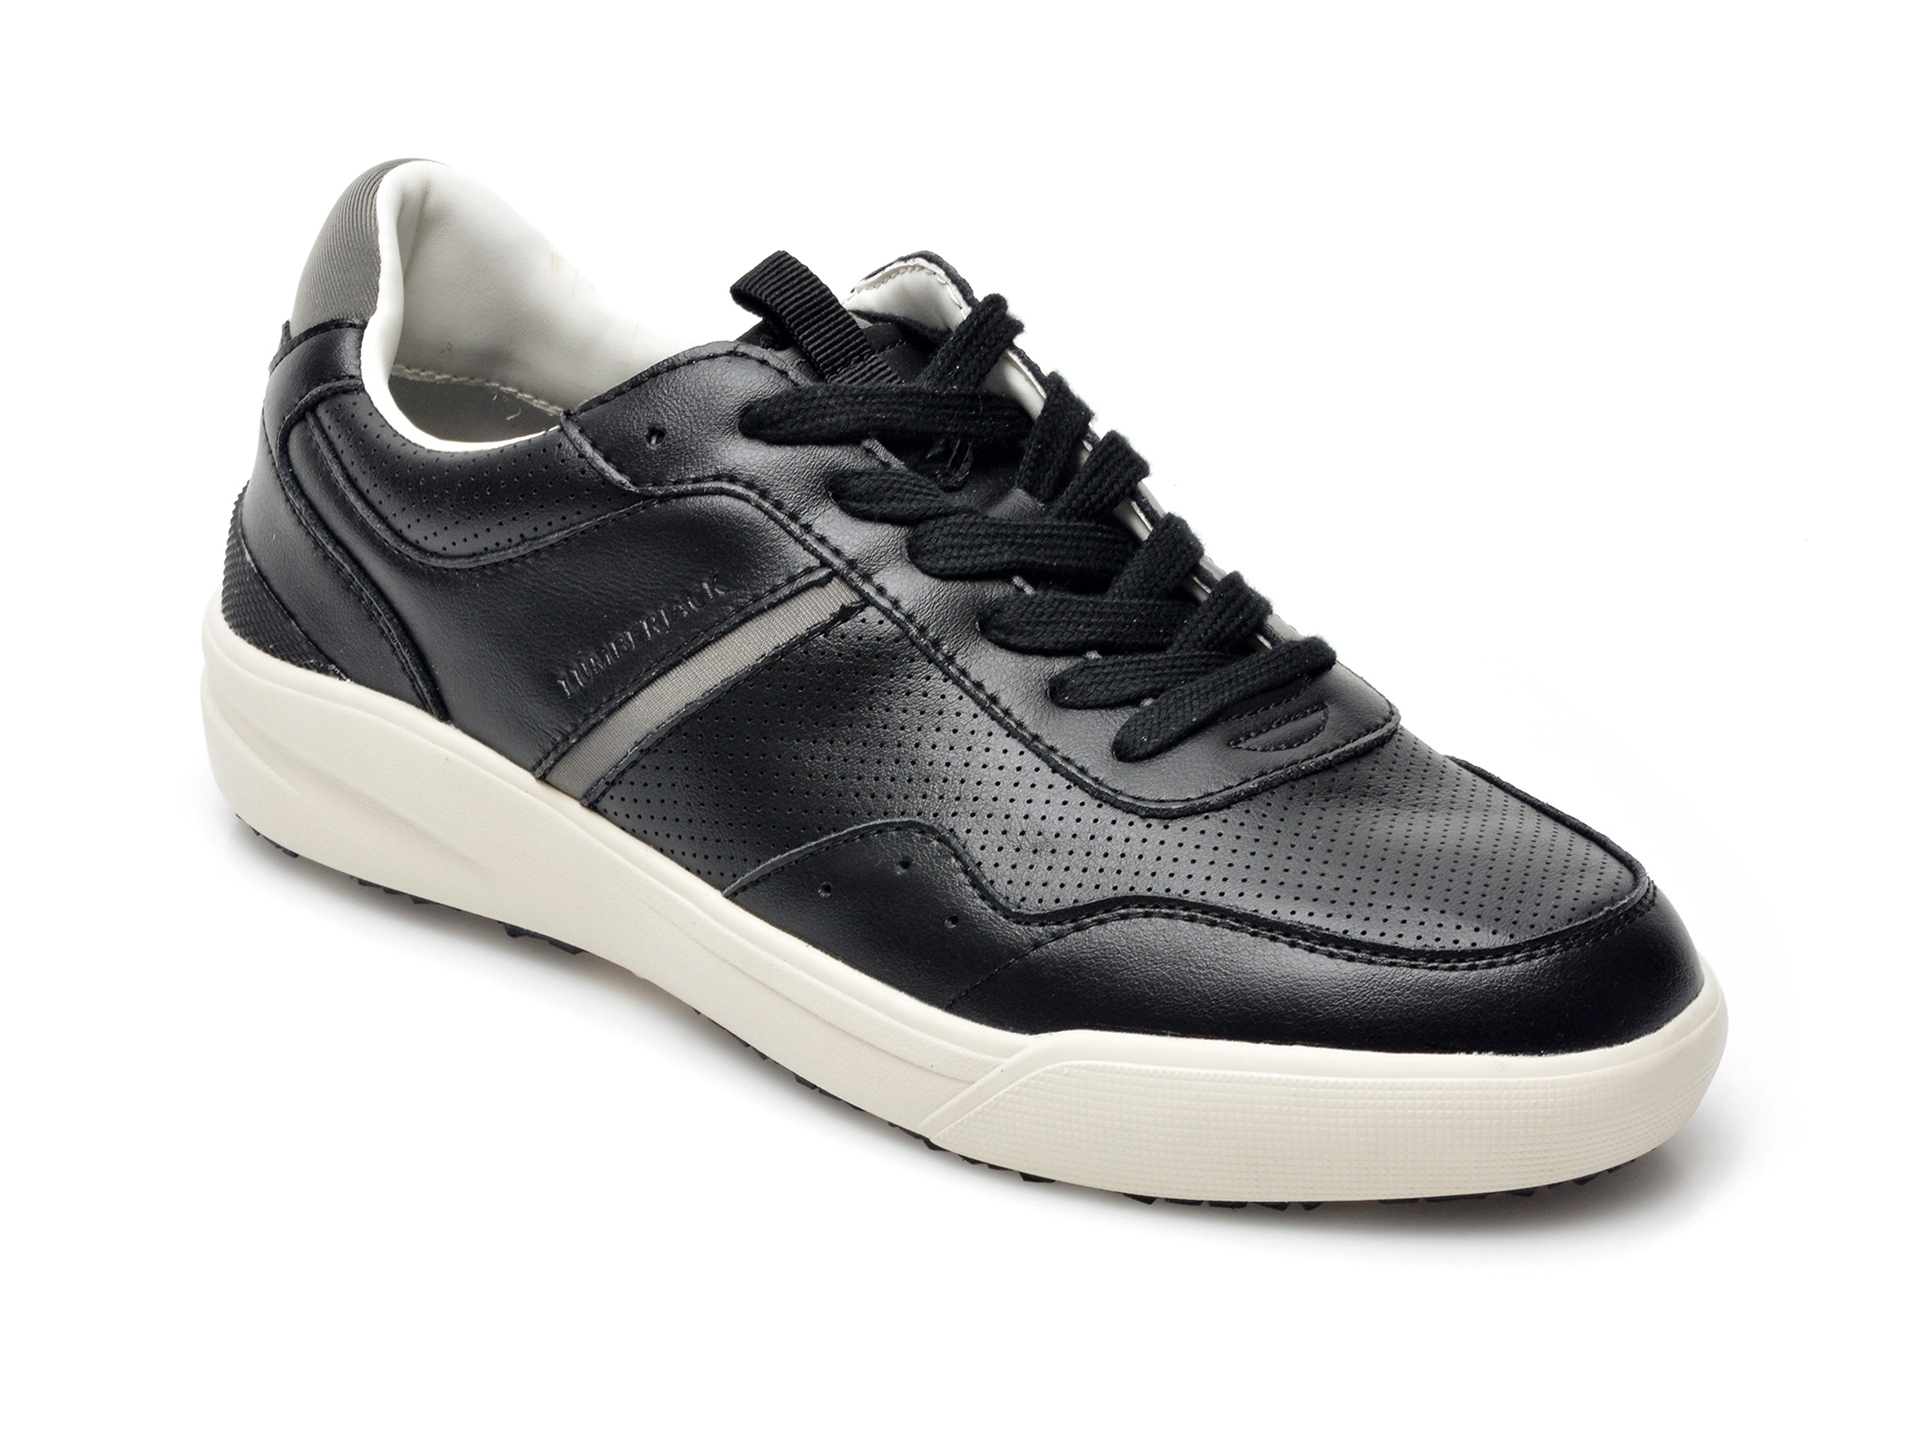 Pantofi sport LUMBERJACK negri, B541001, din piele naturala